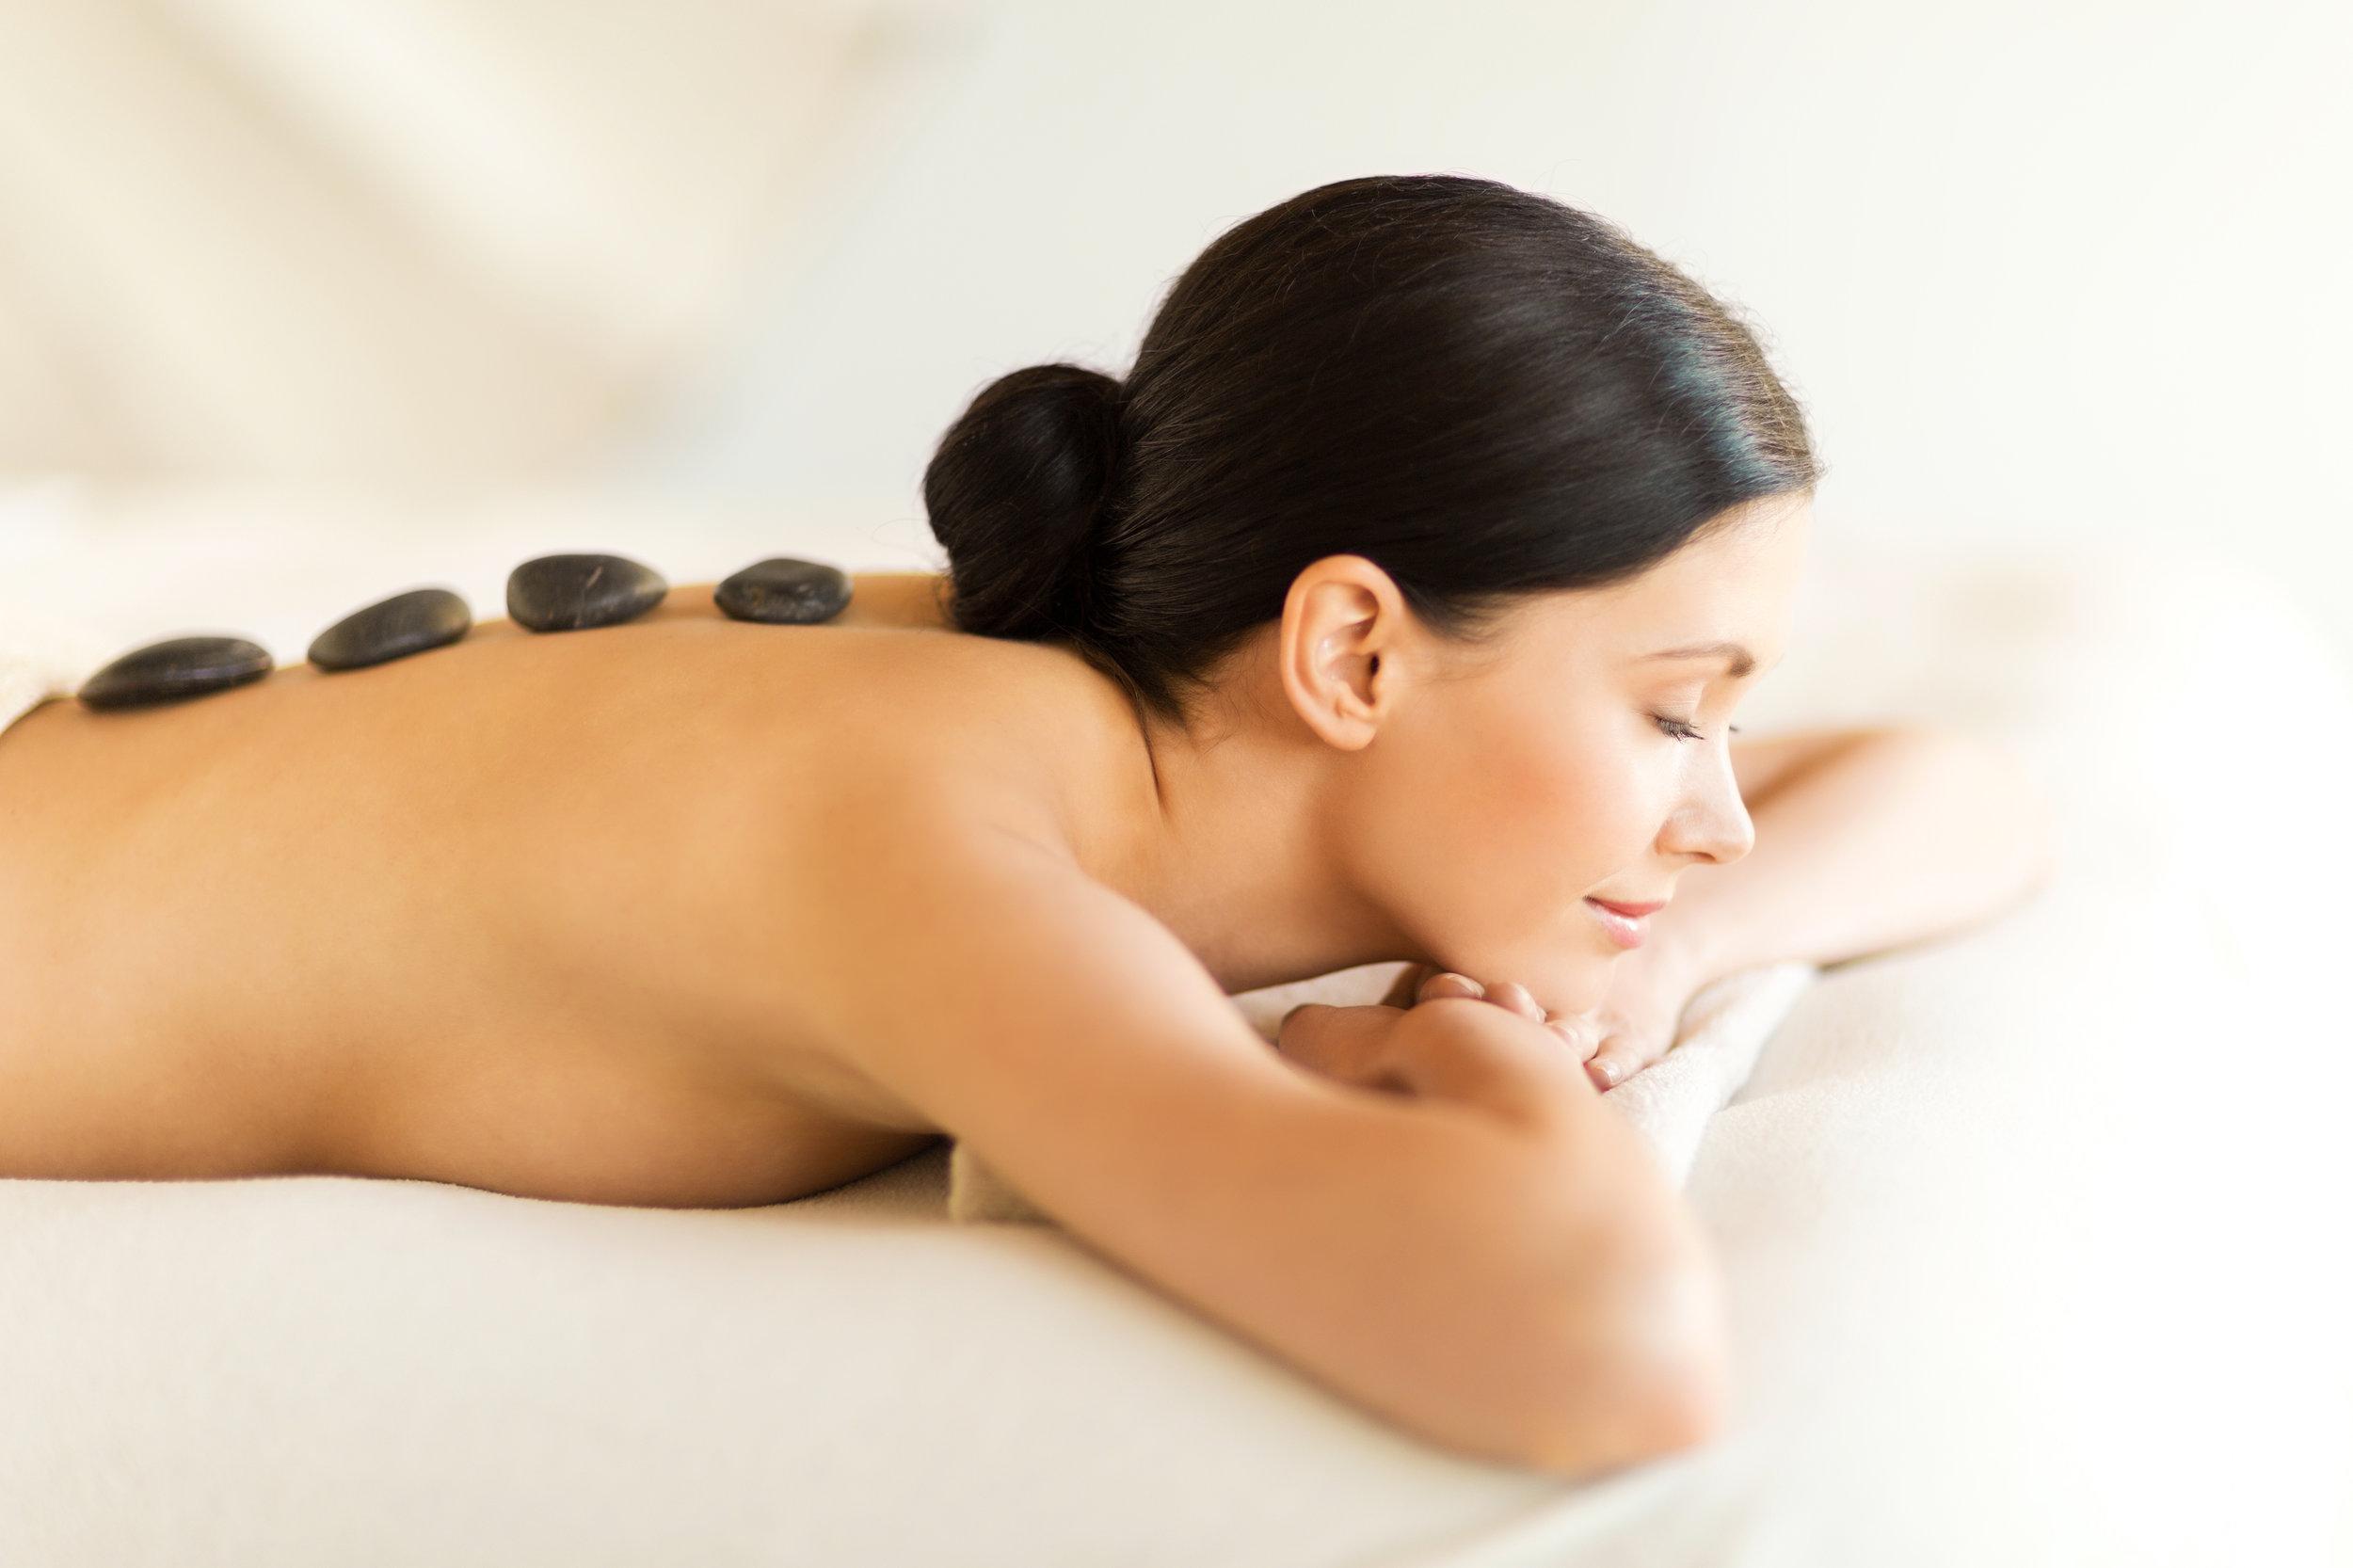 bigstock-picture-of-woman-in-spa-salon-101929262.jpg